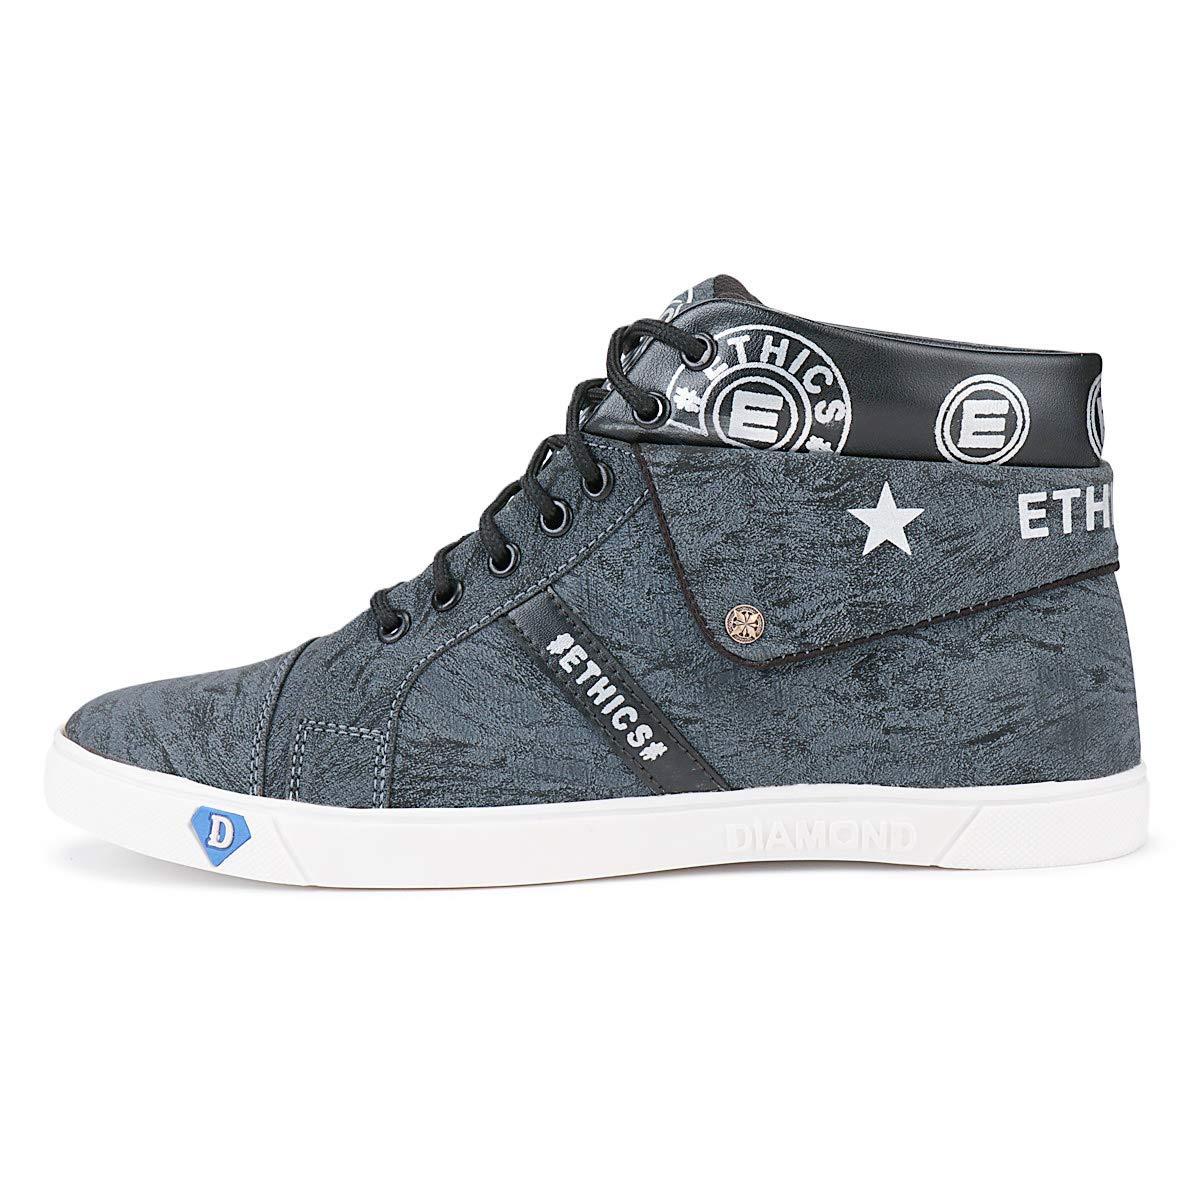 6e688c691e ETHICS Perfect Black Sneaker Shoes for Women